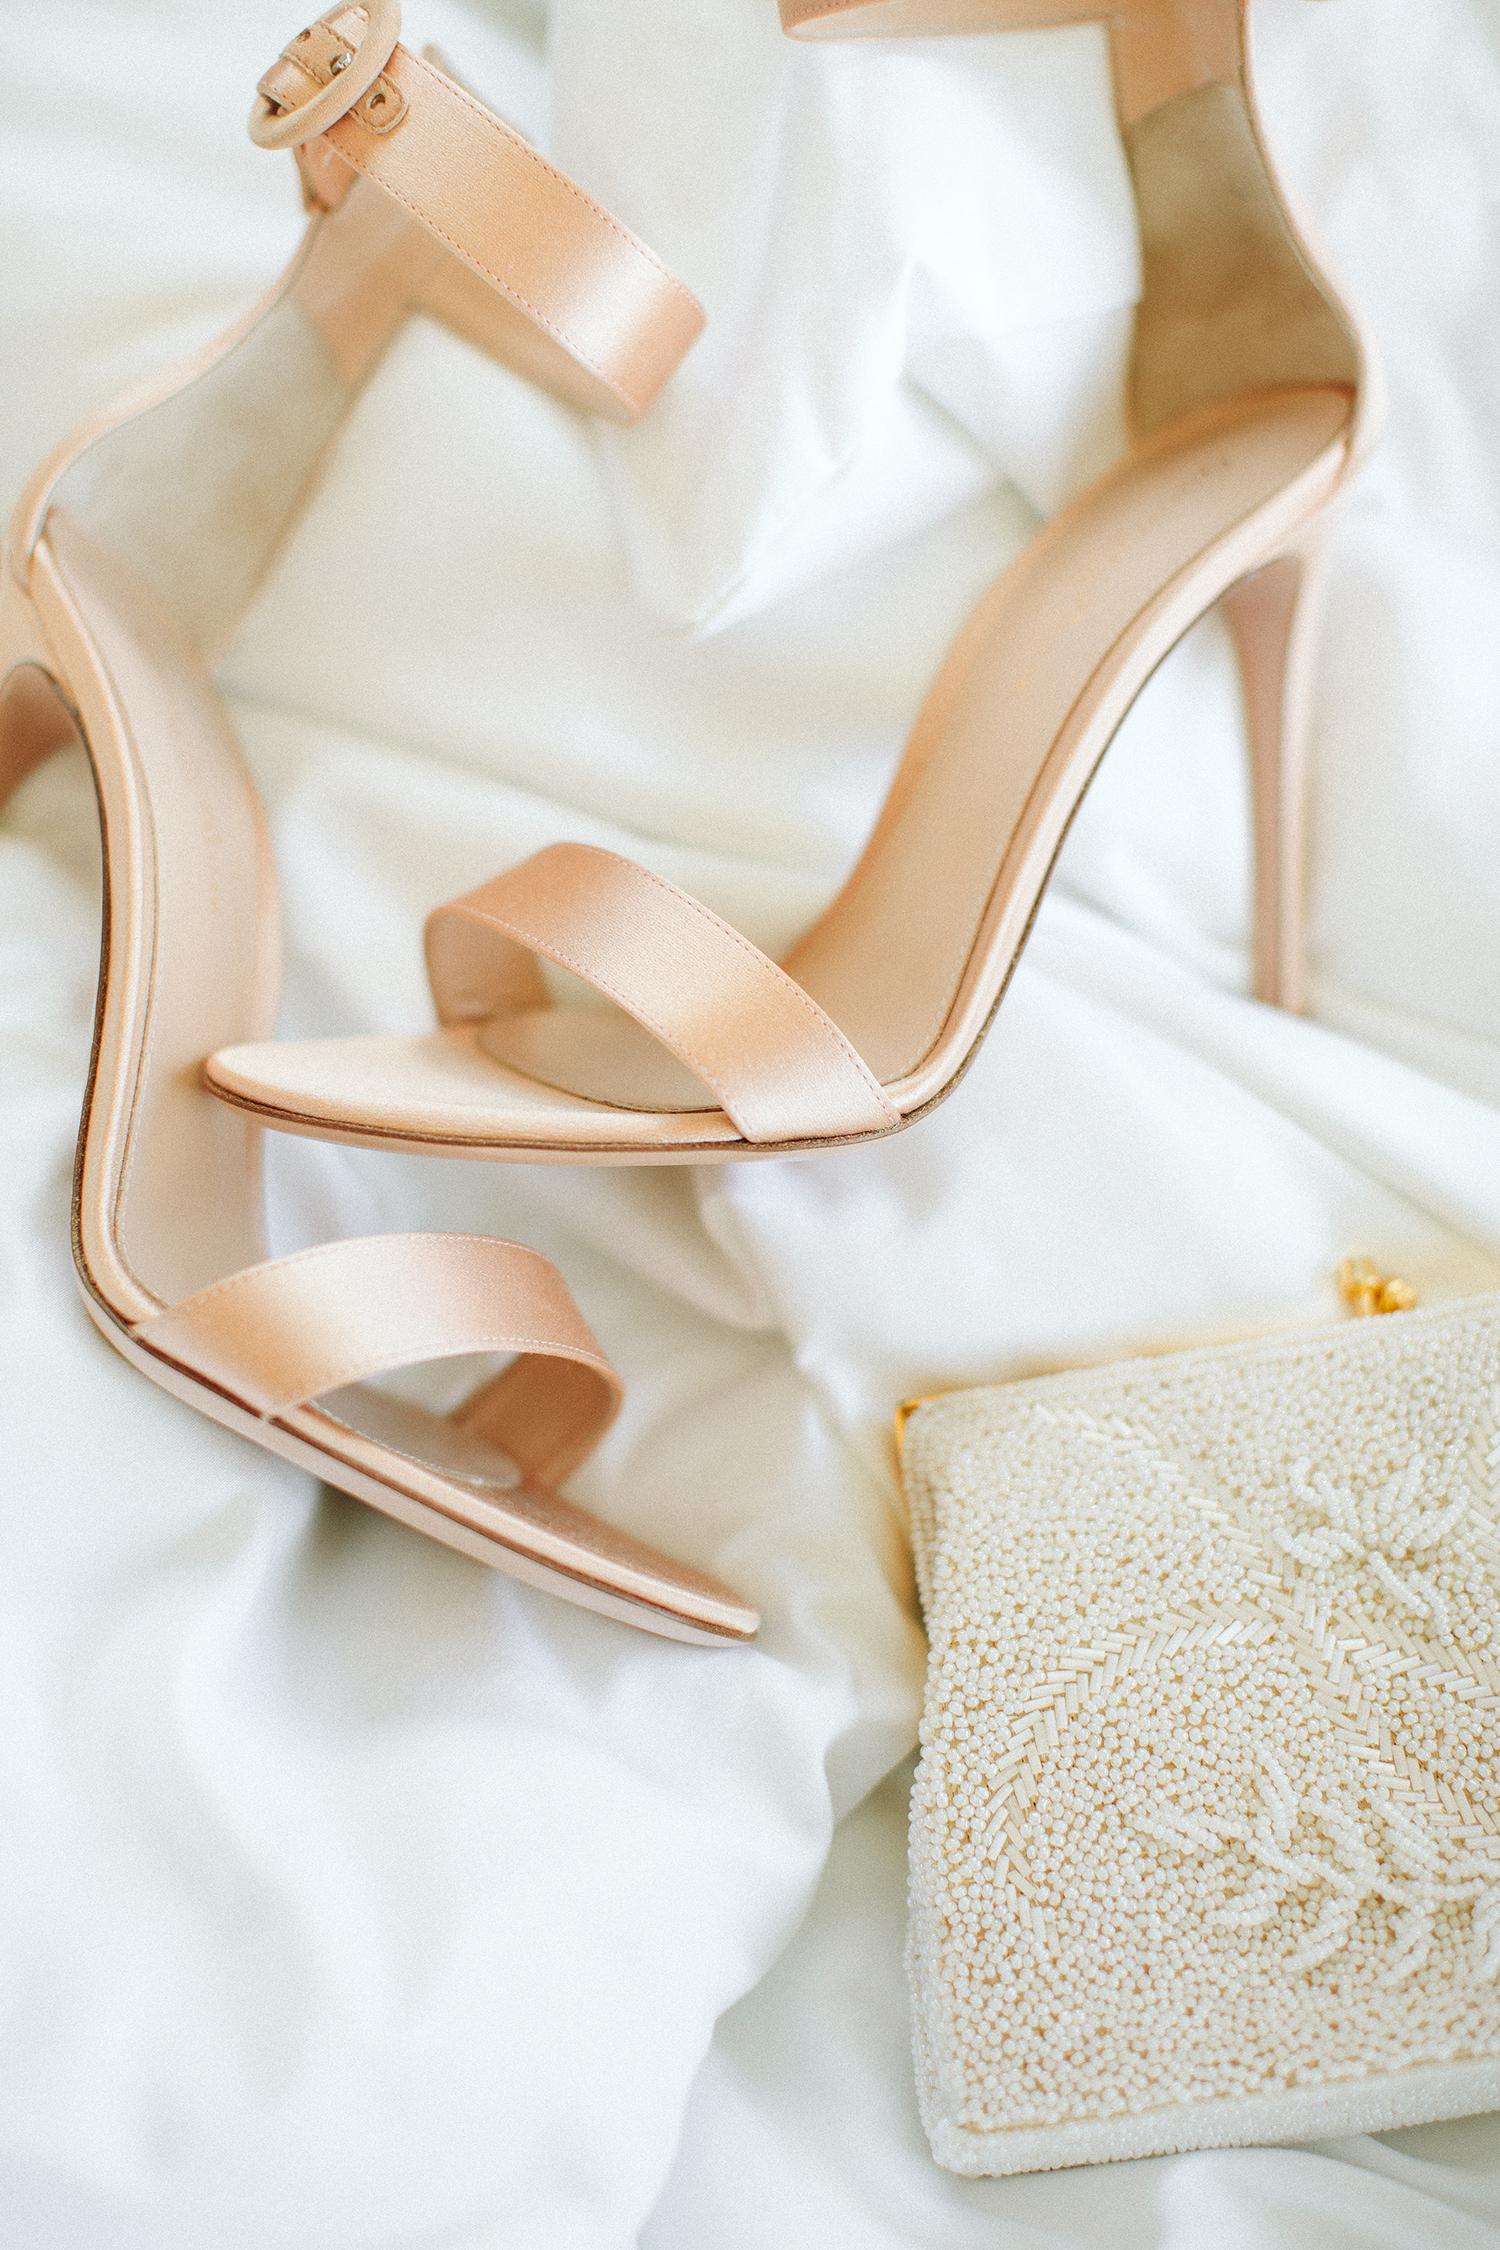 ashley basil wedding accessories brides shoes